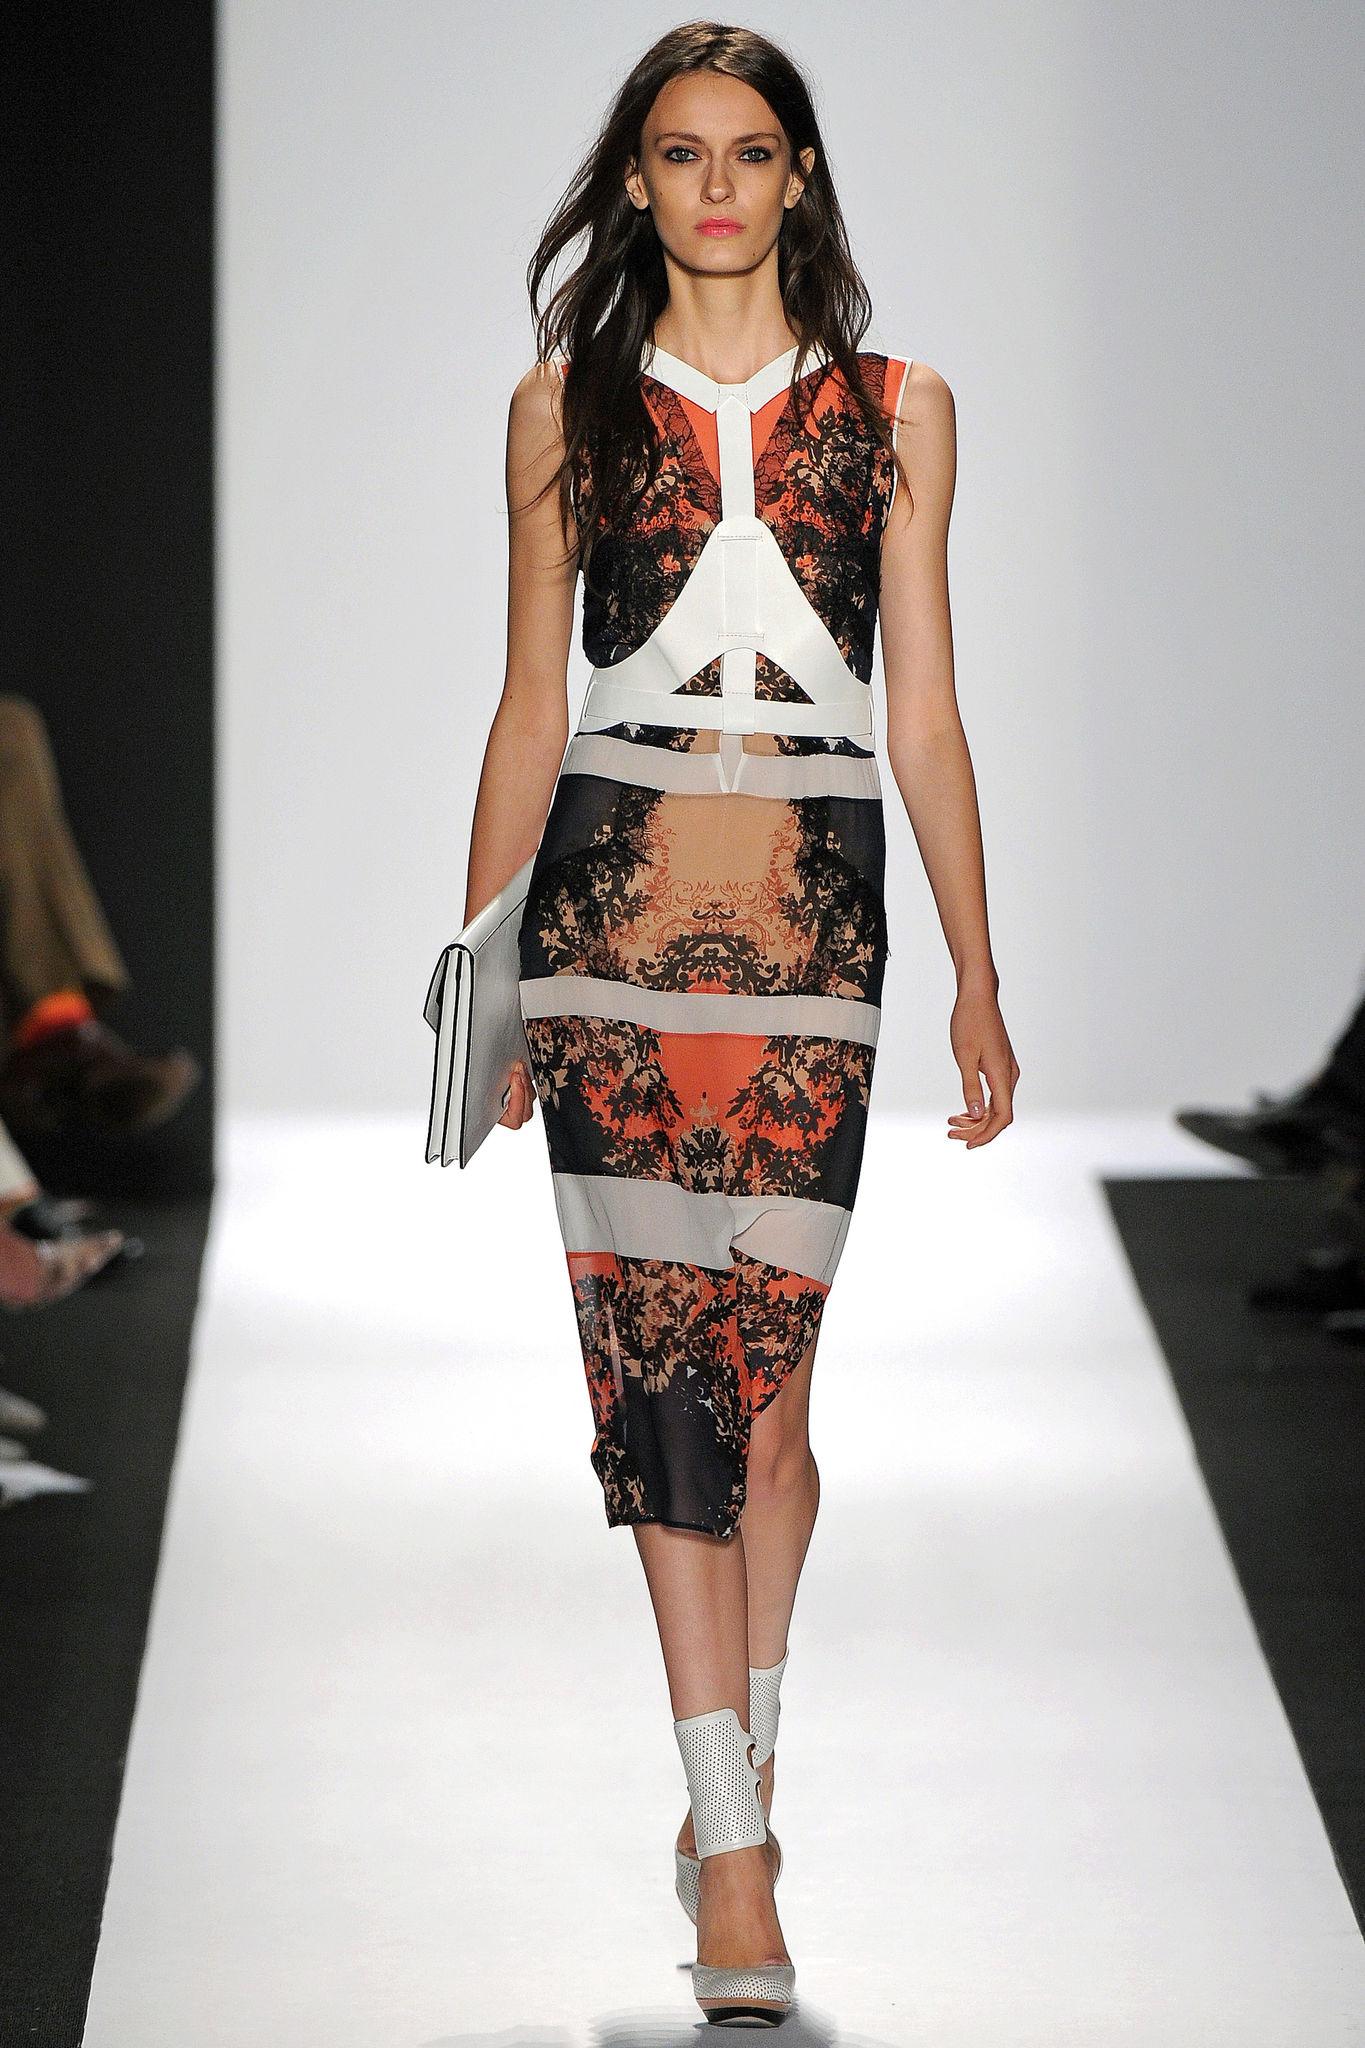 BCBG Max Azria Spring 2013 Collection New York Fashion Week